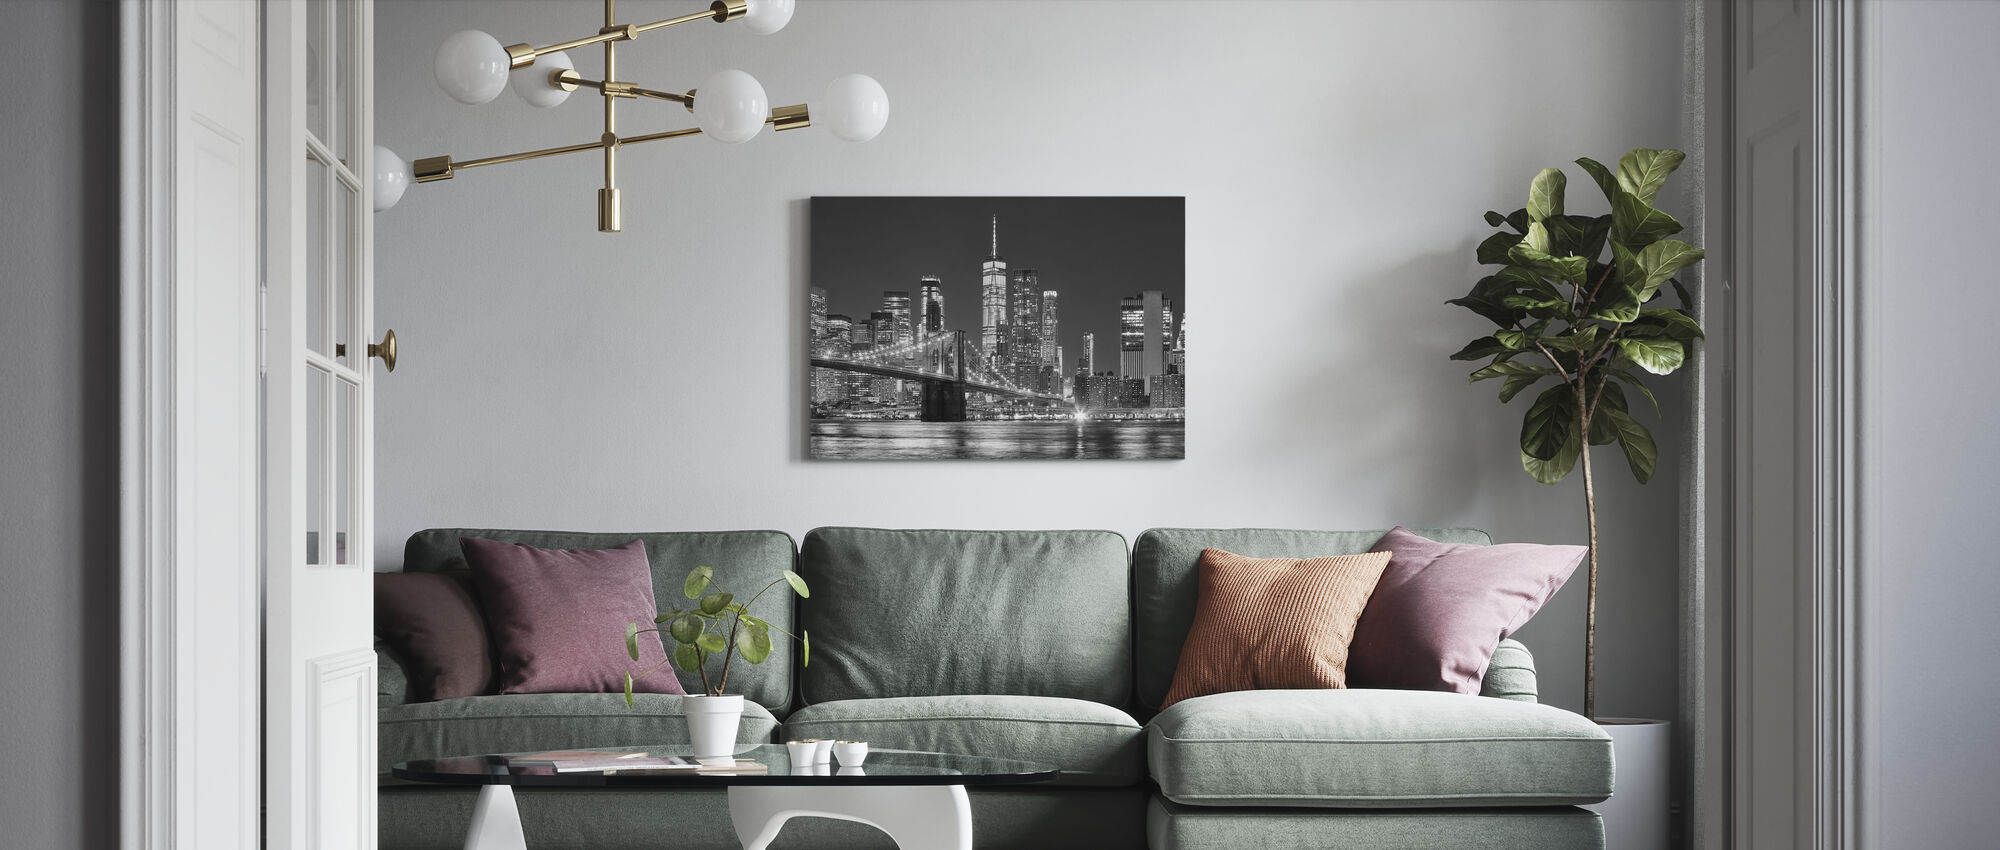 Manhattan Skyline at Night - Canvas print - Living Room